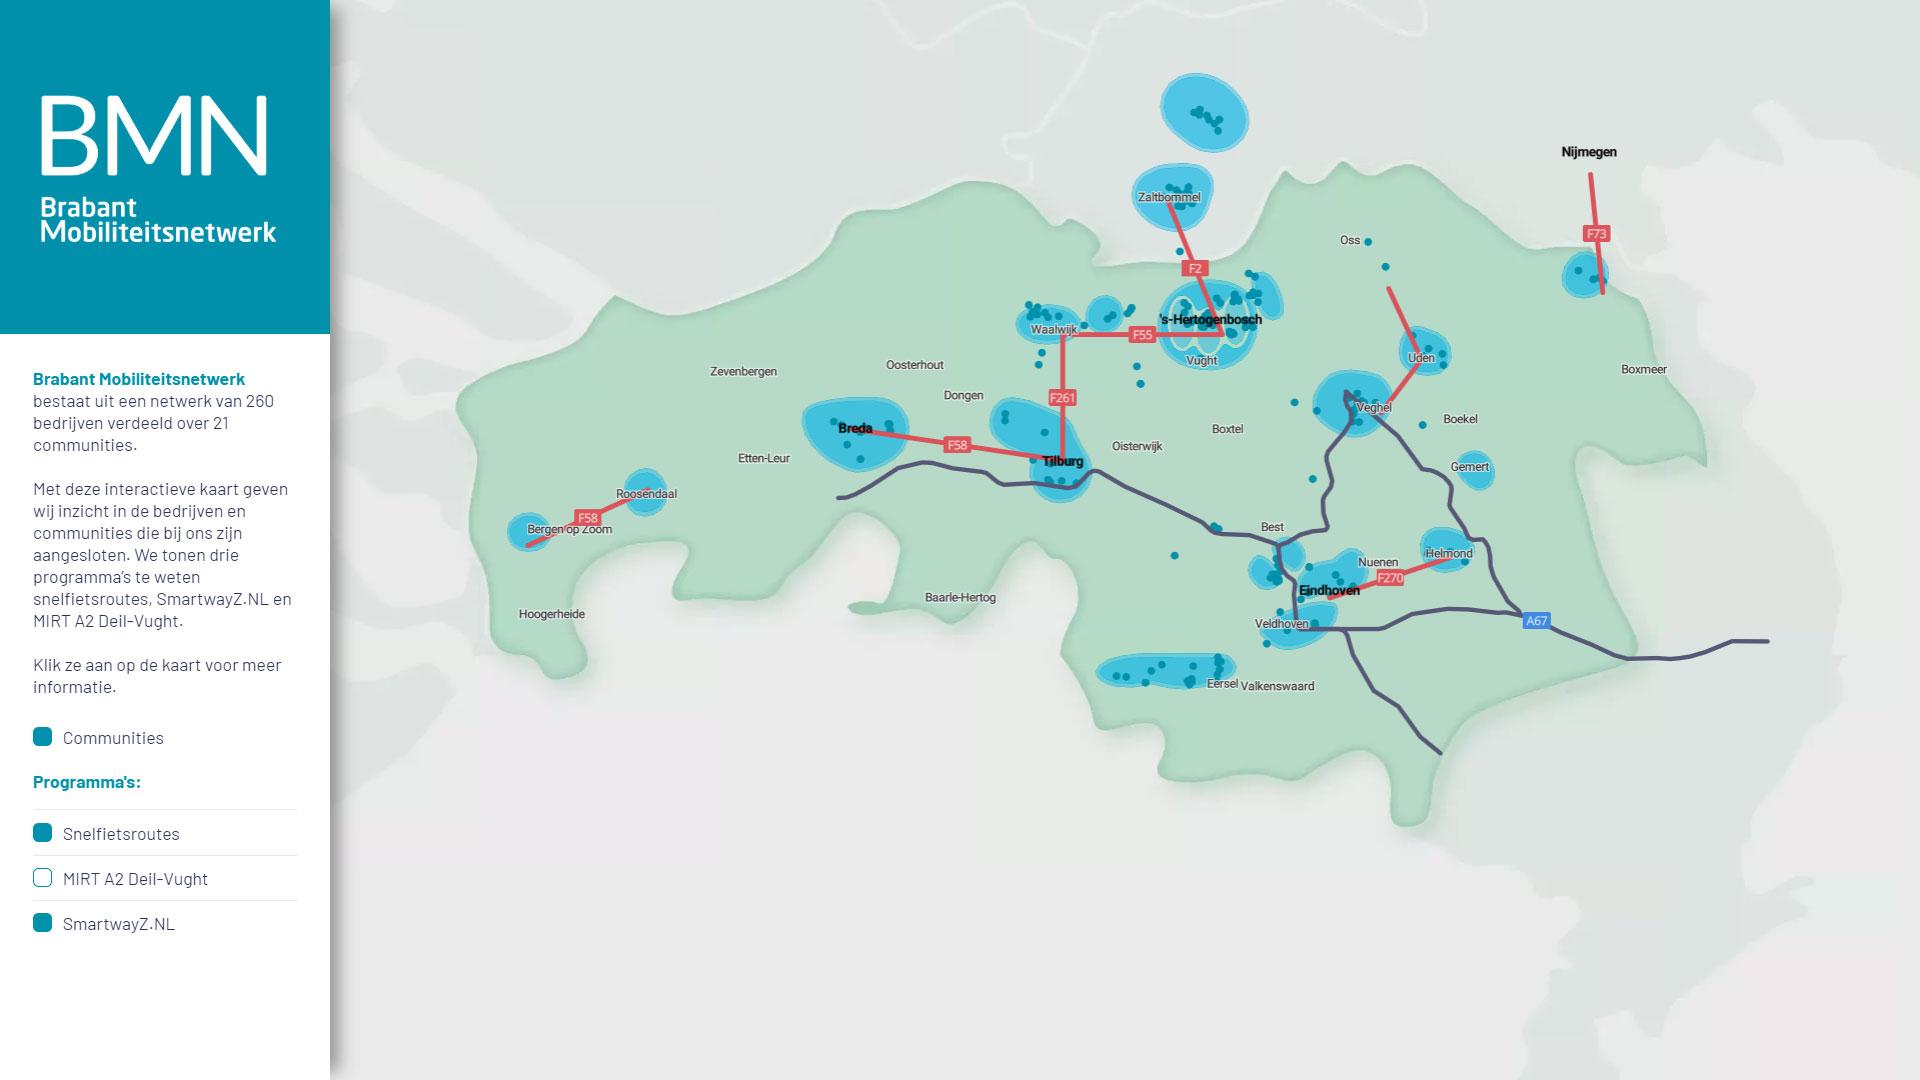 Brabant Mobiliteitsnetwerk header image